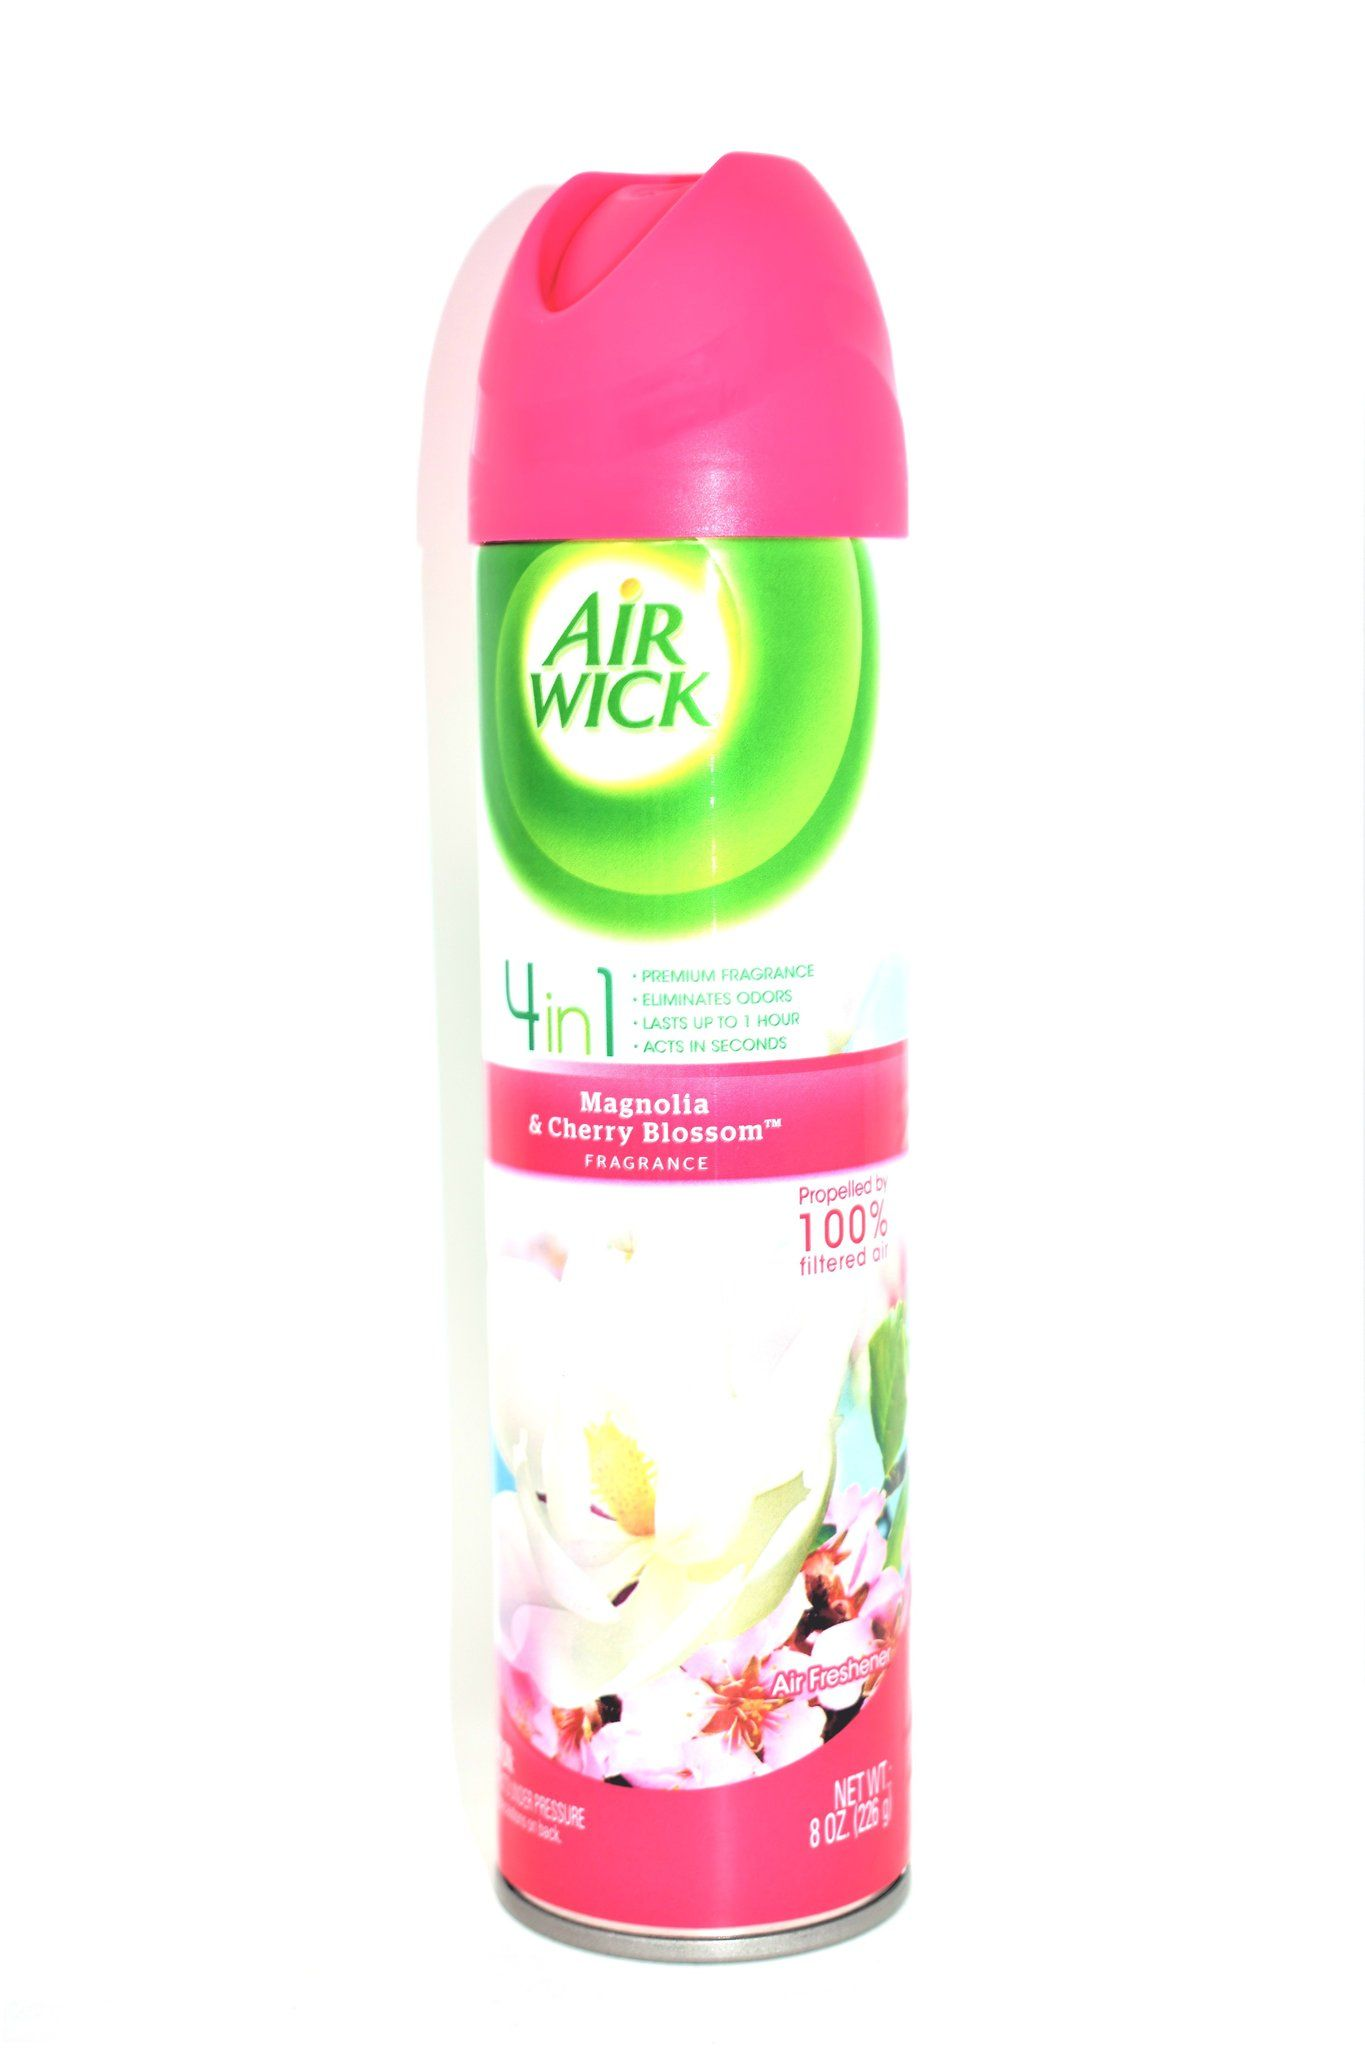 Air Wick 4 In 1 Air Freshener Magnolia Cherry Blossom Fragrance 8 O Marketcol Cherry Blossom Fragrance Fragrance Air Wick